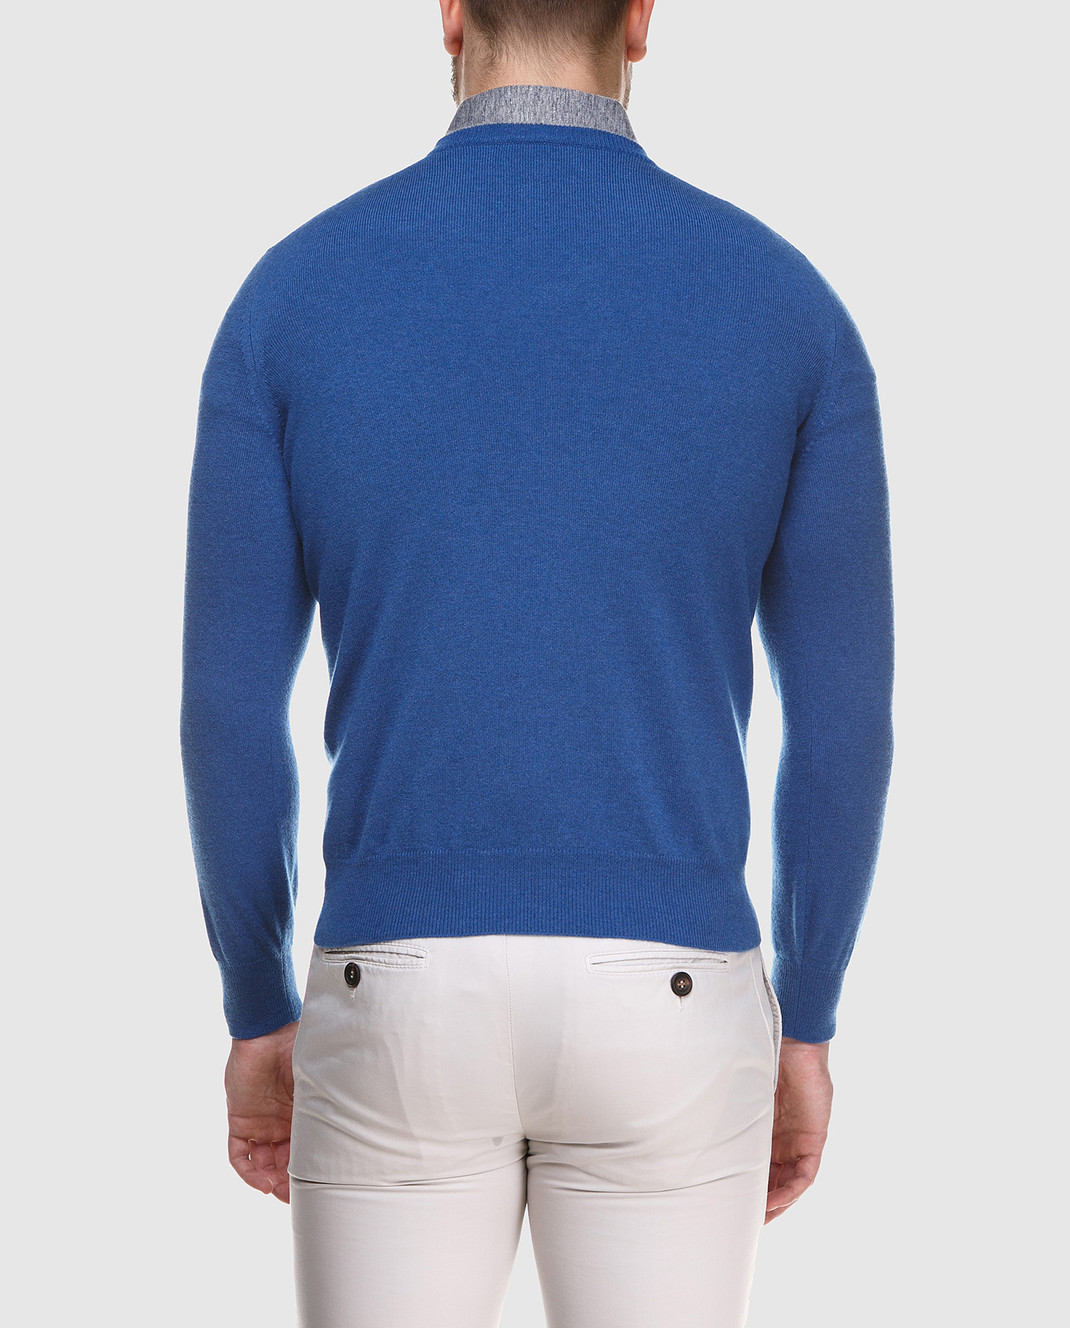 Brunello Cucinelli Синий пуловер M2200162 изображение 4